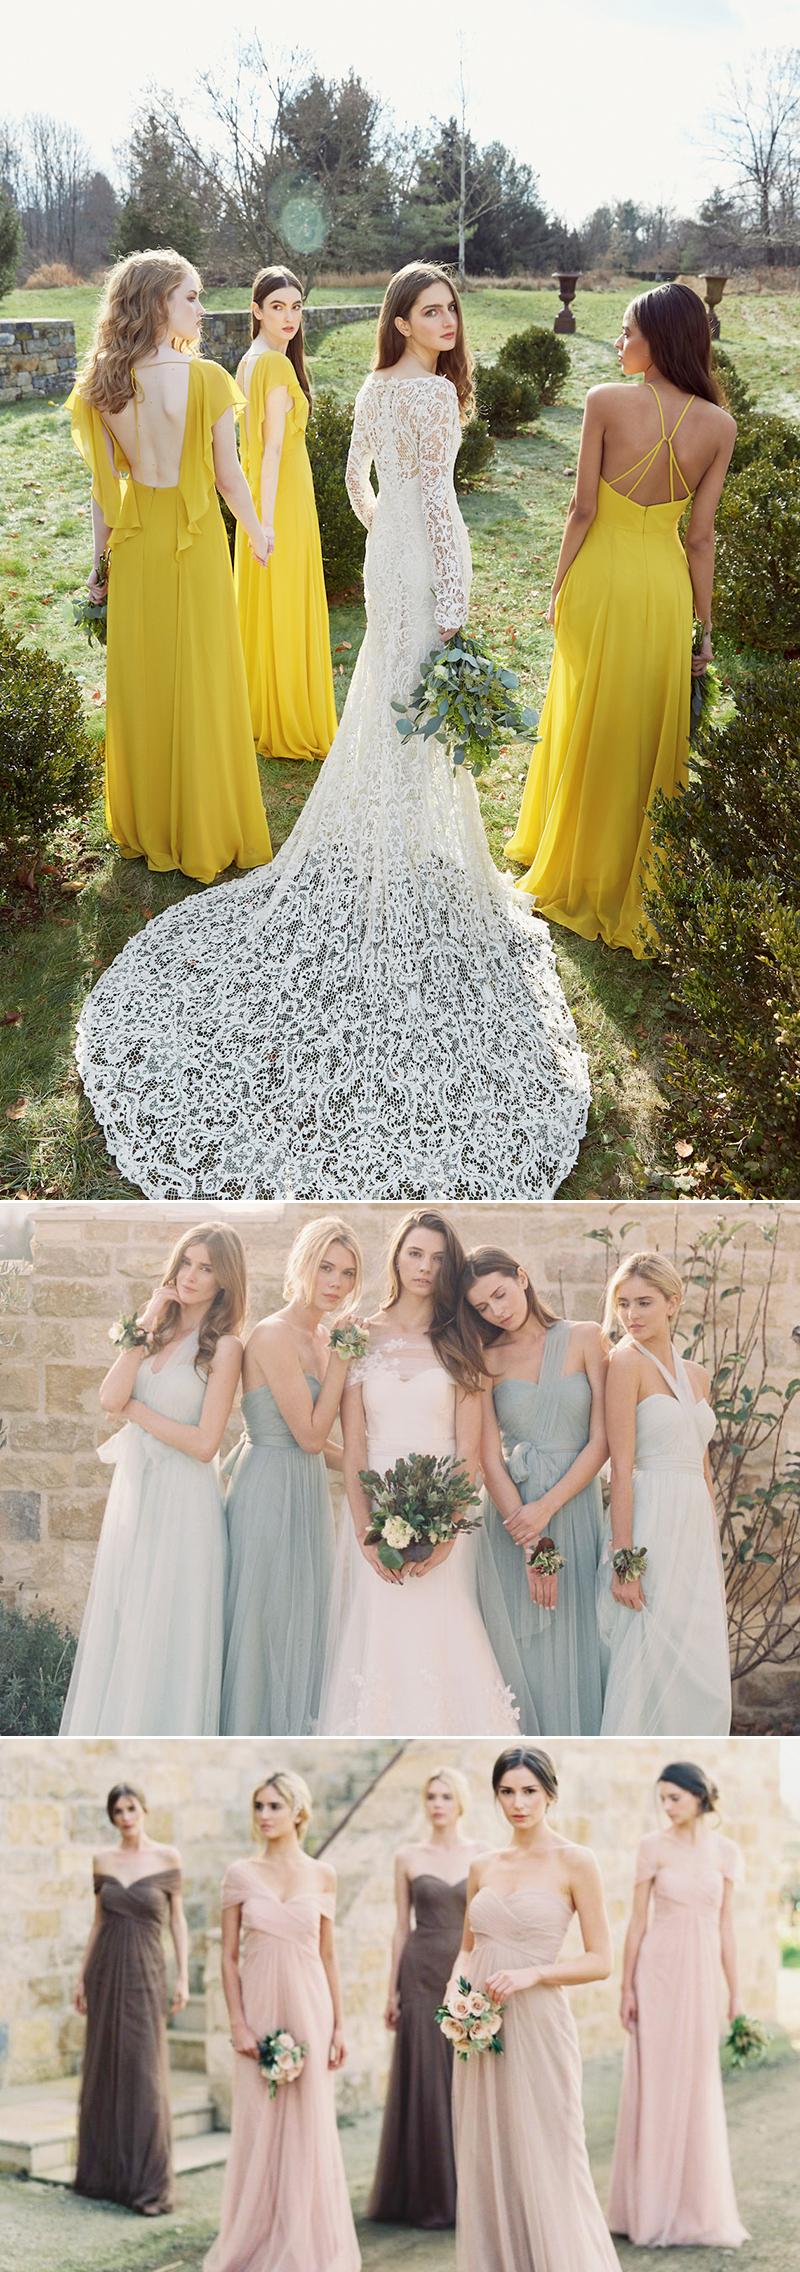 7 Best Places To Buy Bridesmaid Dresses Online! - Praise Wedding